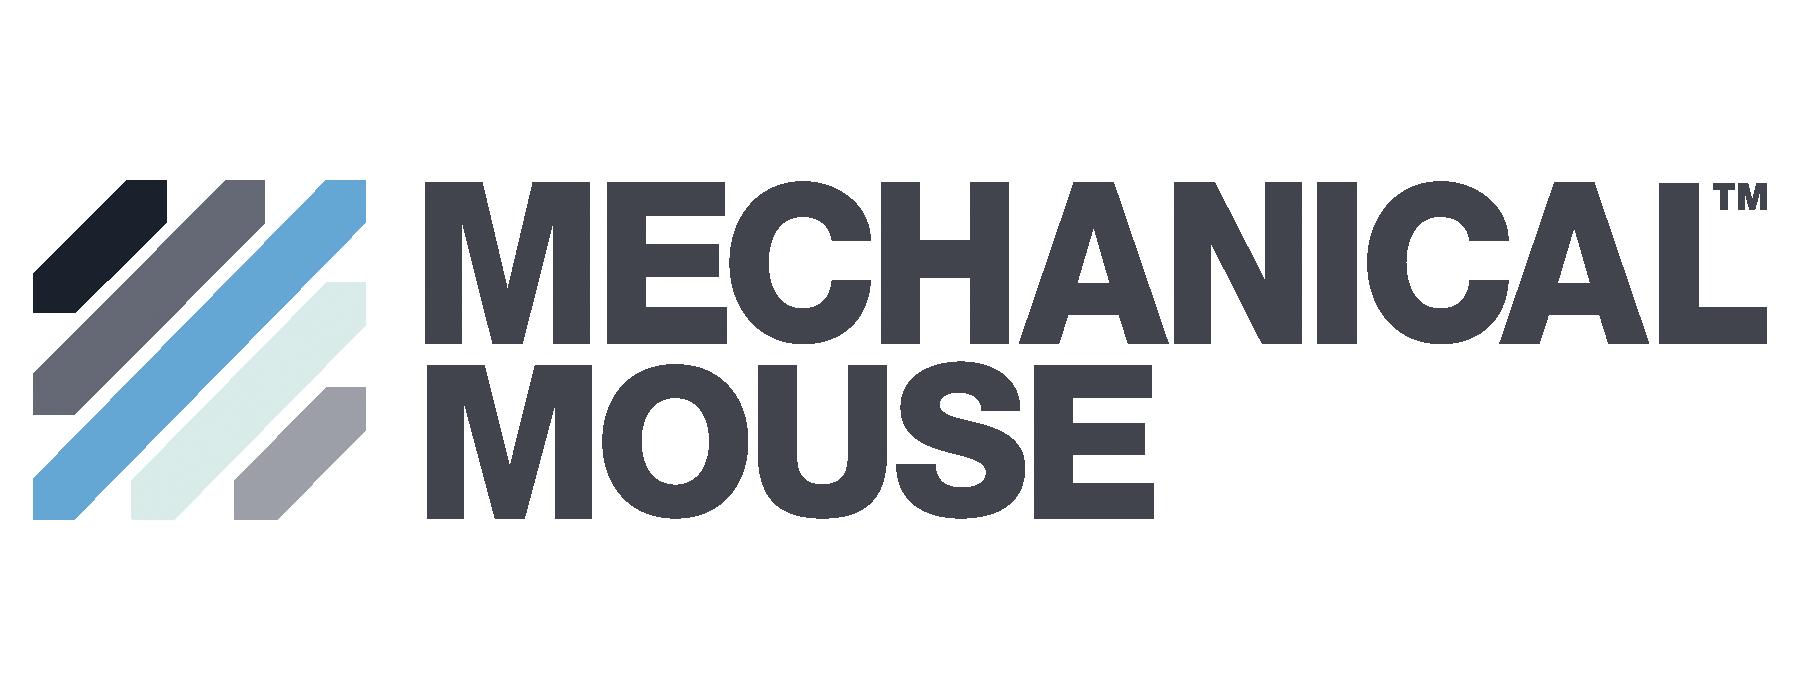 MechanicalMouse company logo